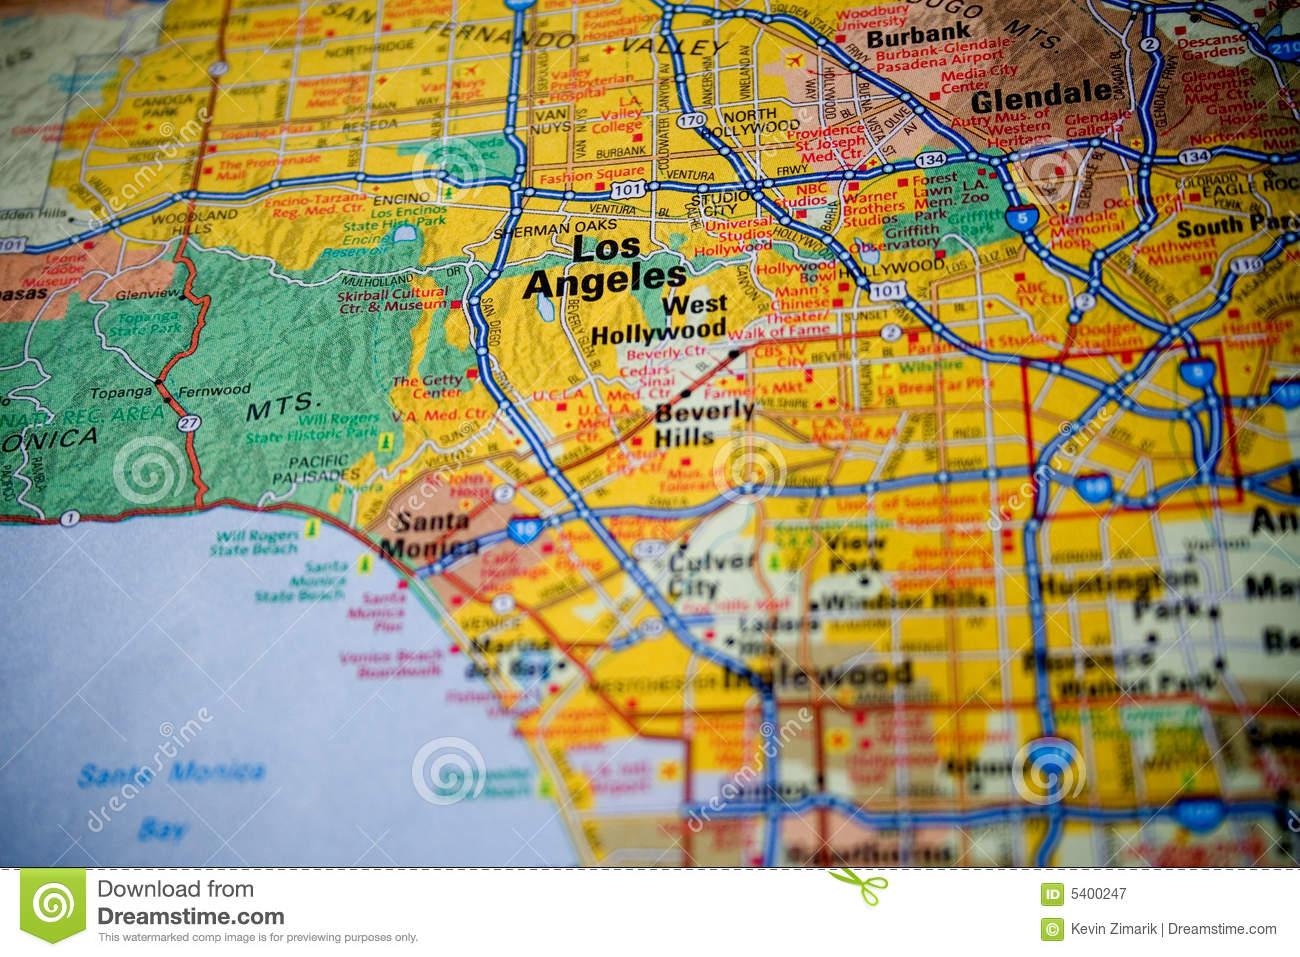 Field Maps California Soccer League Inc - Maps soccer